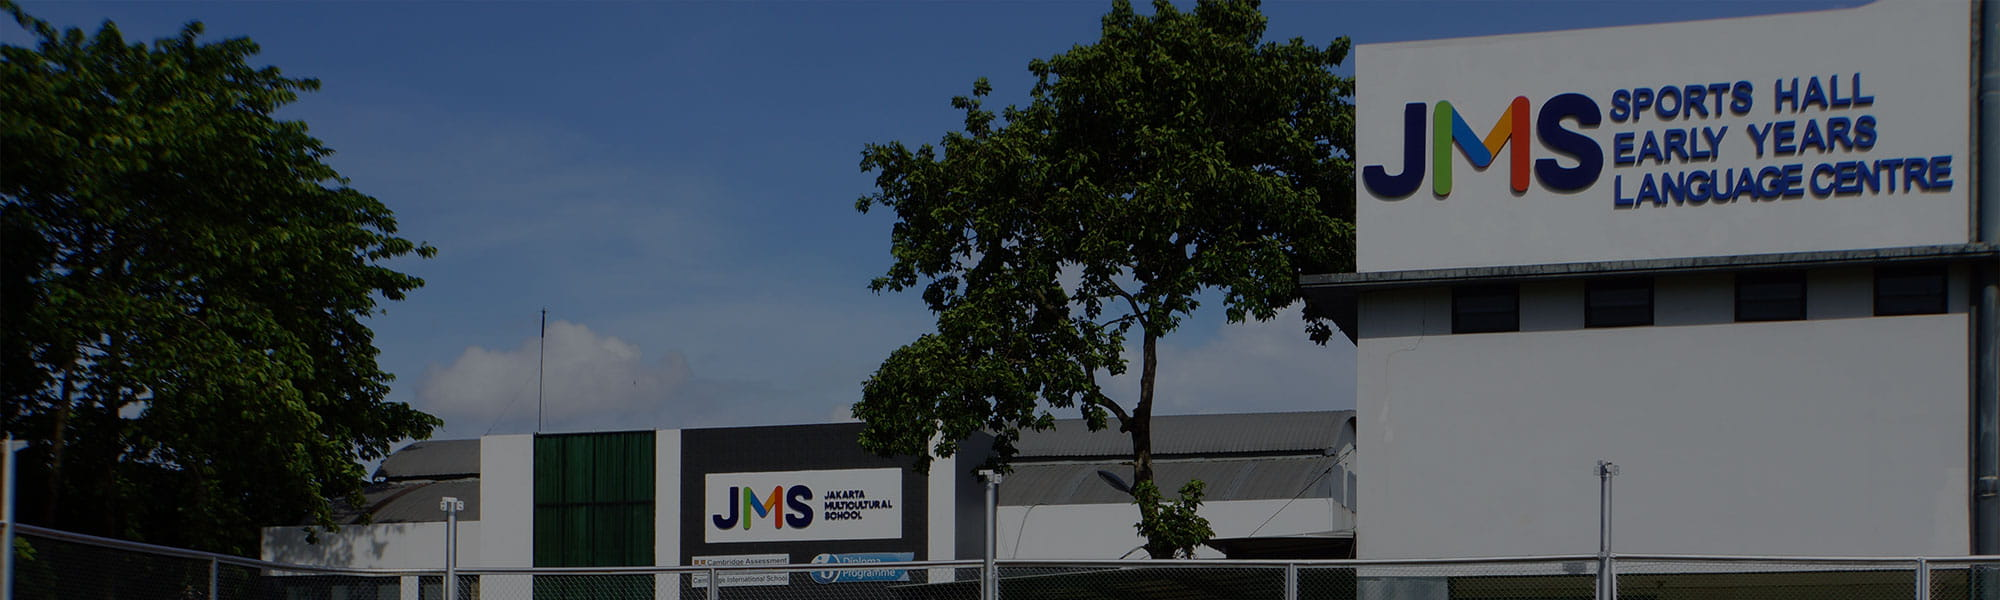 JMS Sports Hall